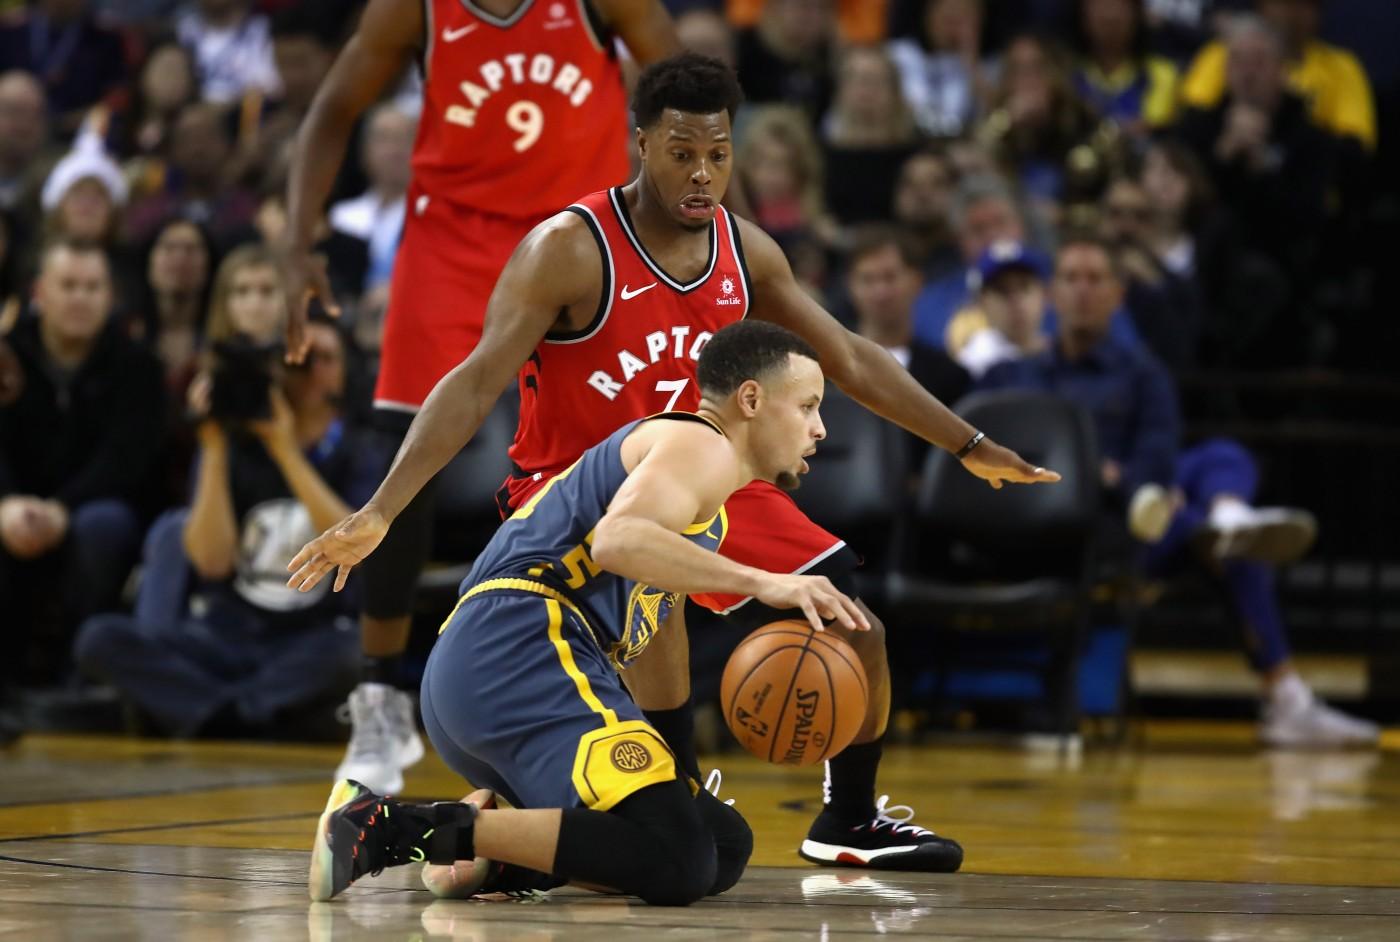 Podcast Bola Presa #189 – Raptors amassa o Warriors; Lakers e Celtics na briga